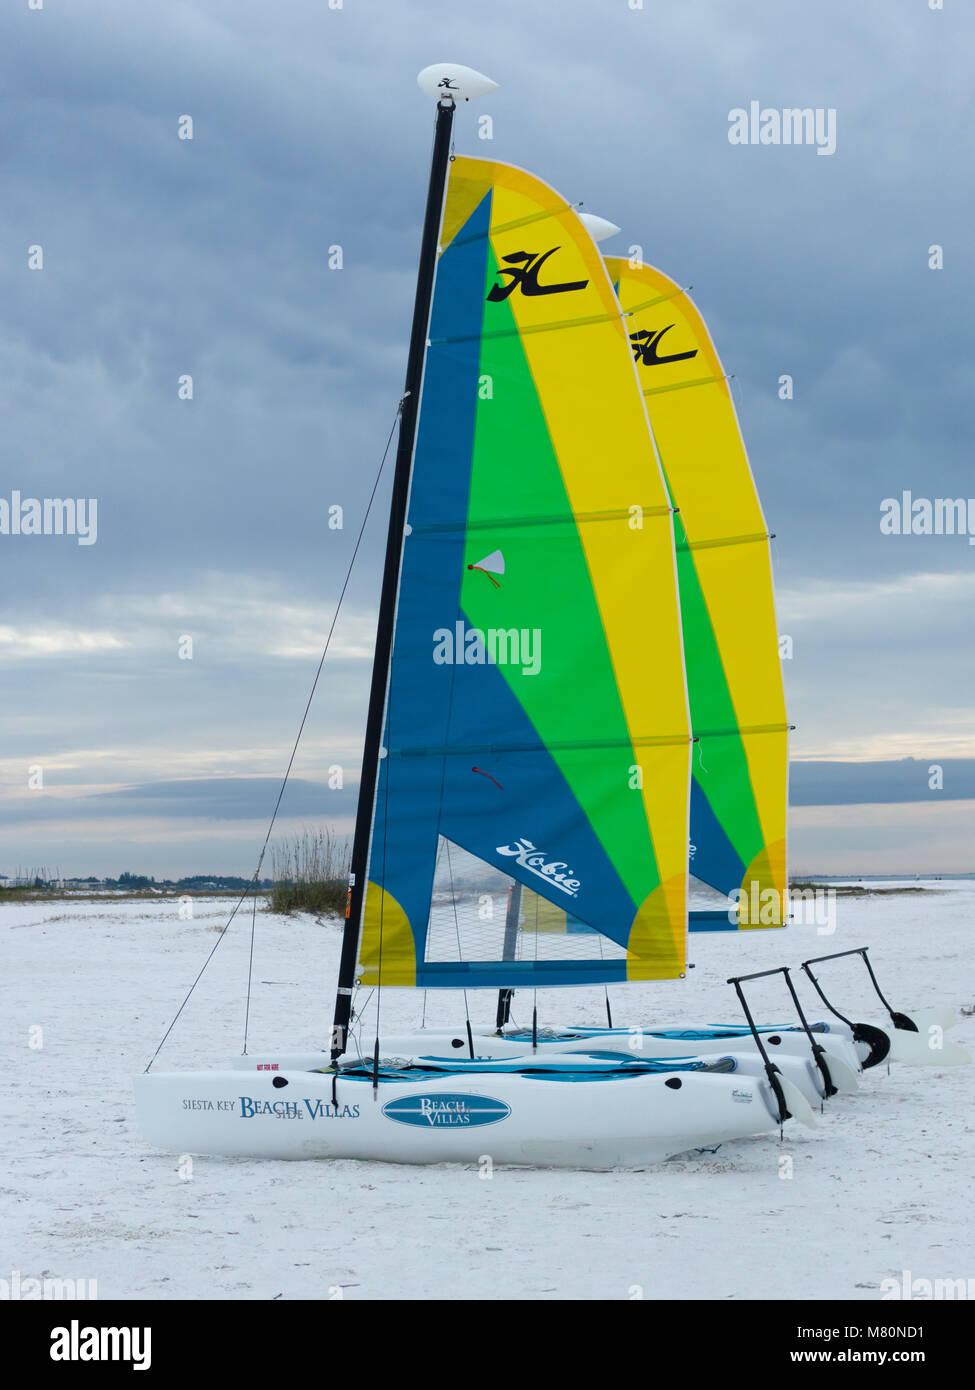 Catamarans on Siesta Key Beach - Stock Image